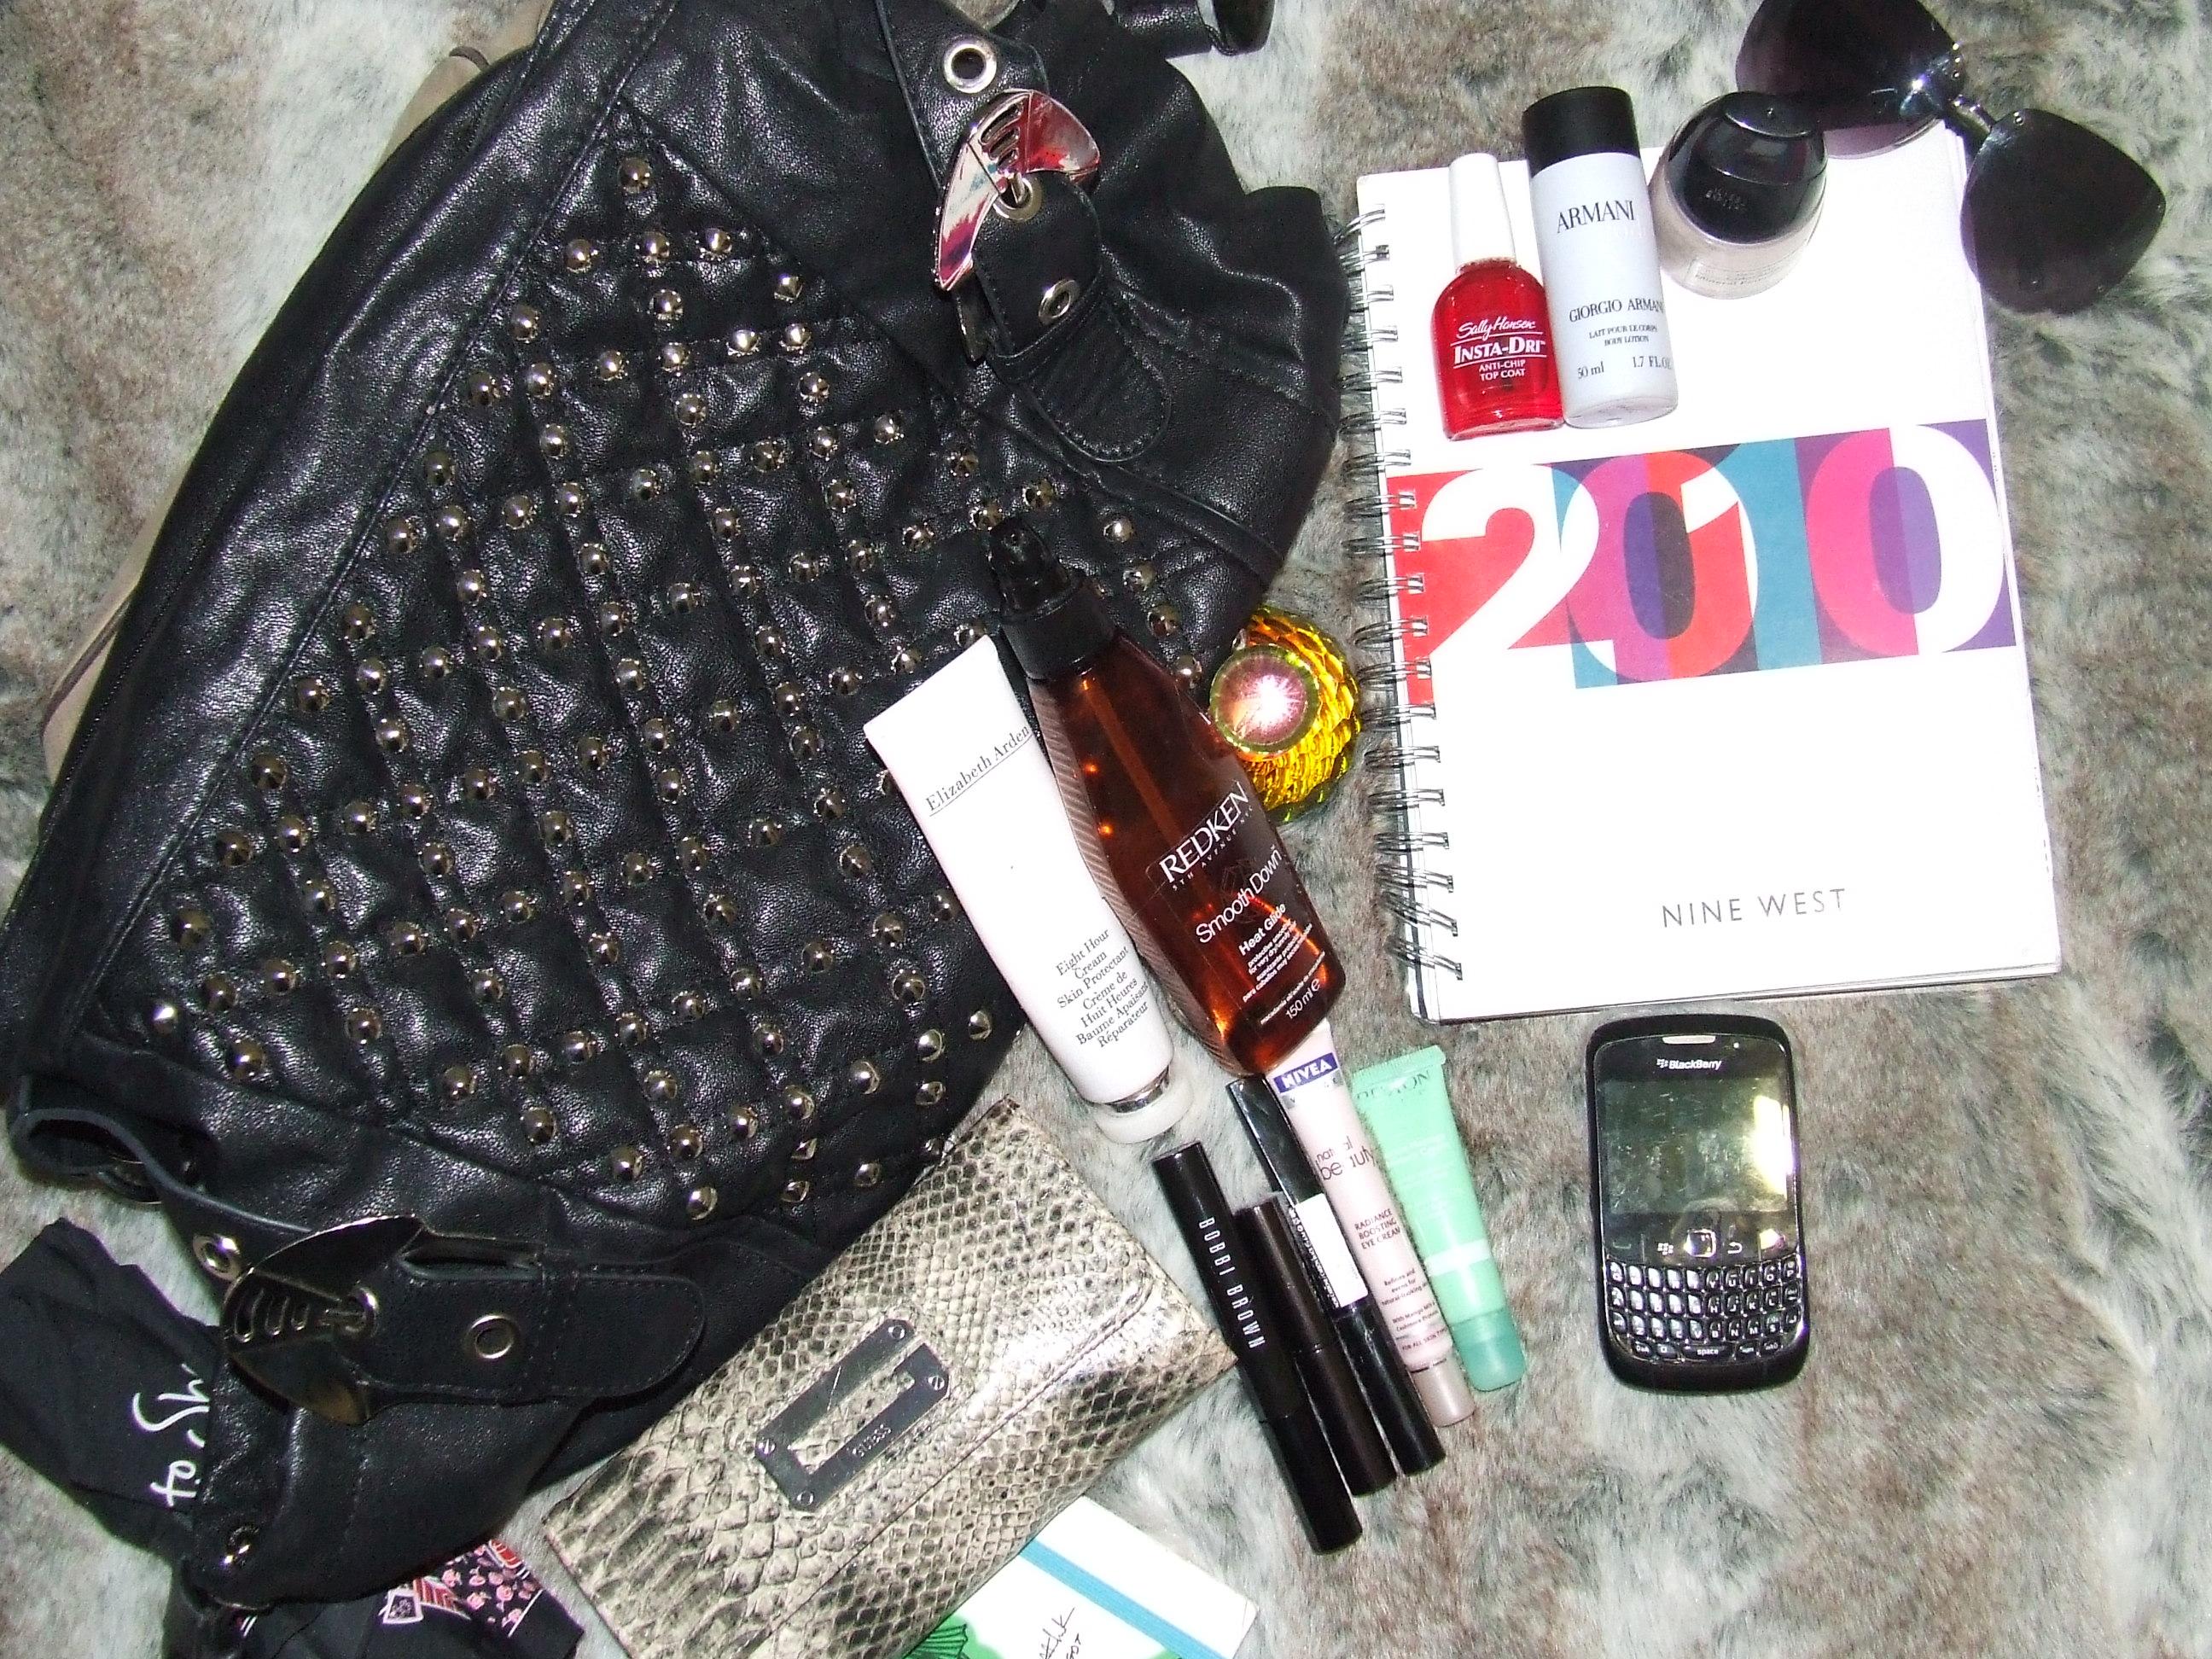 Inside the Fearless Fashionistas handbag